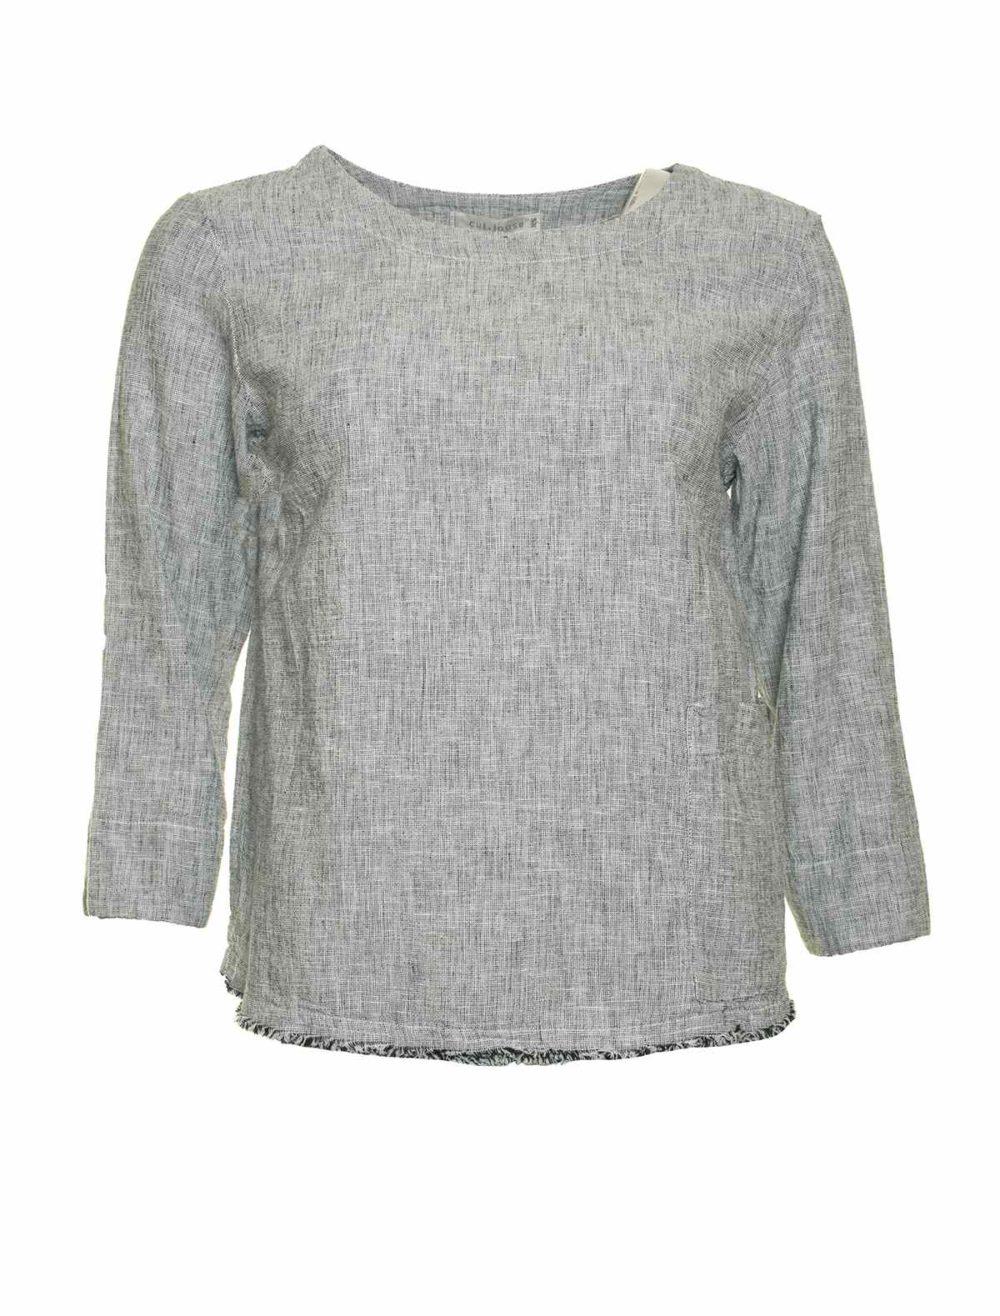 4197335 Shell Top Cut Loose Katie Kerr Women's Clothing